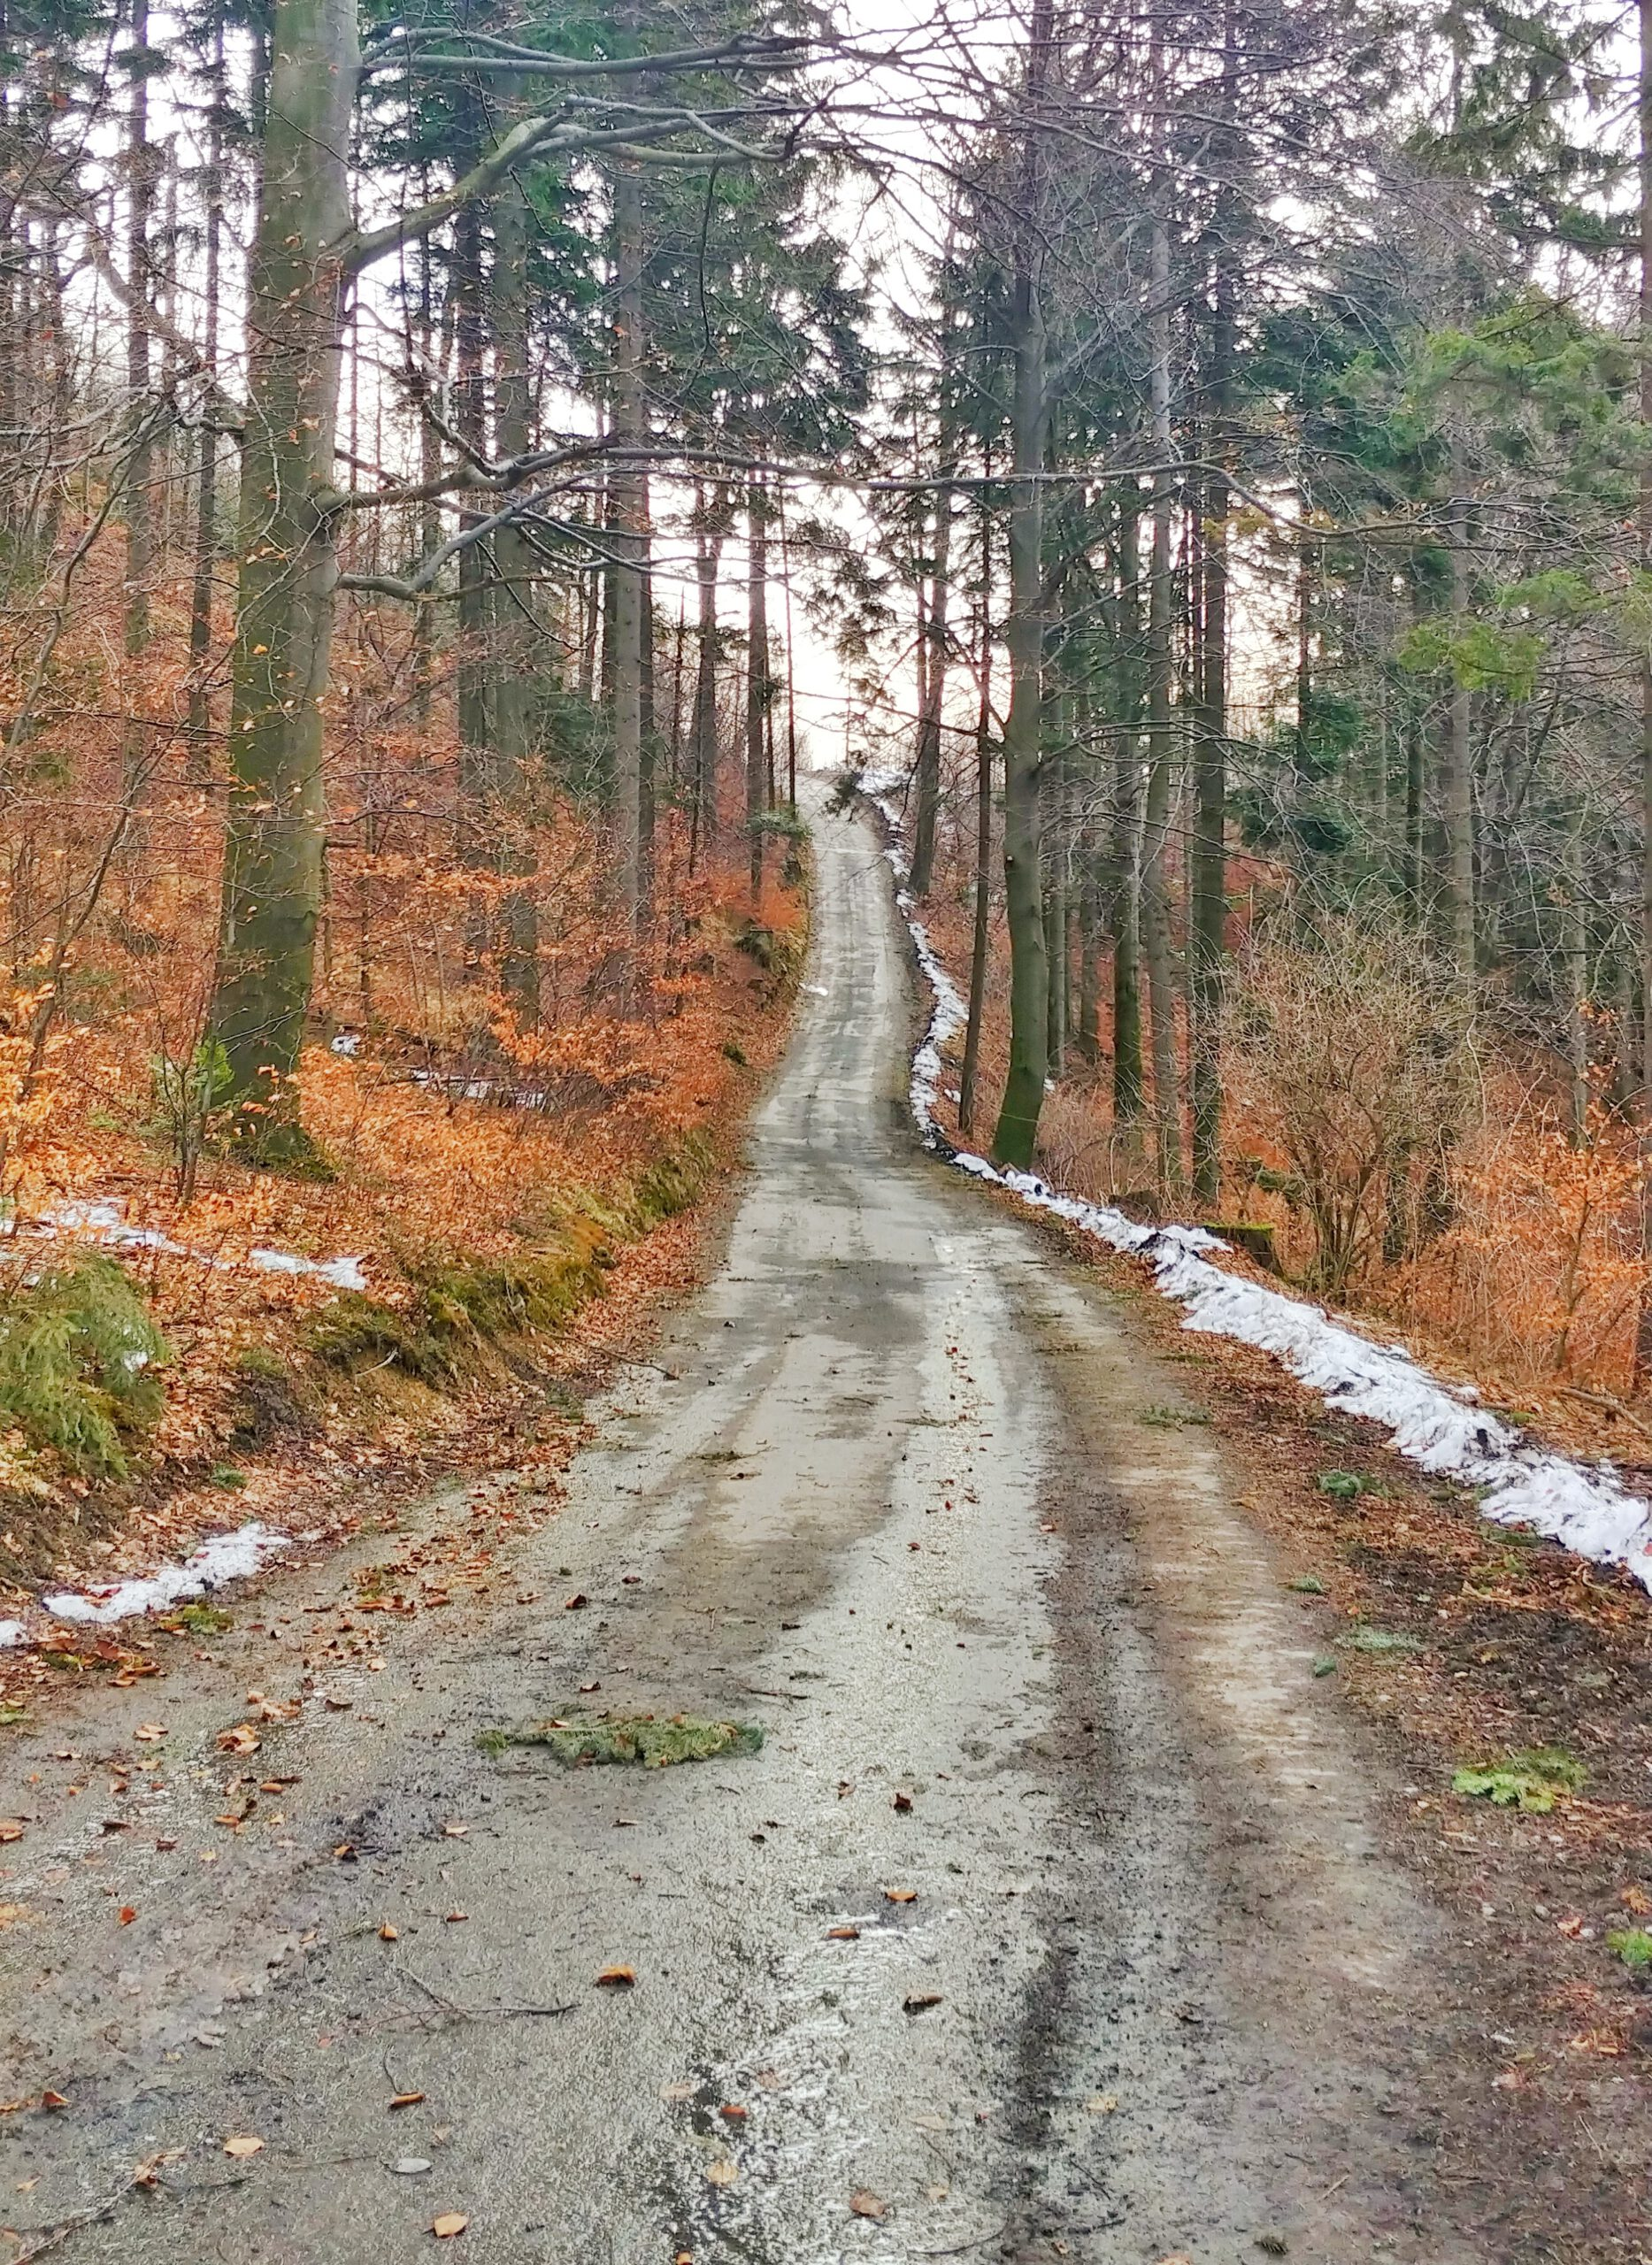 droga przez las, pod gókę